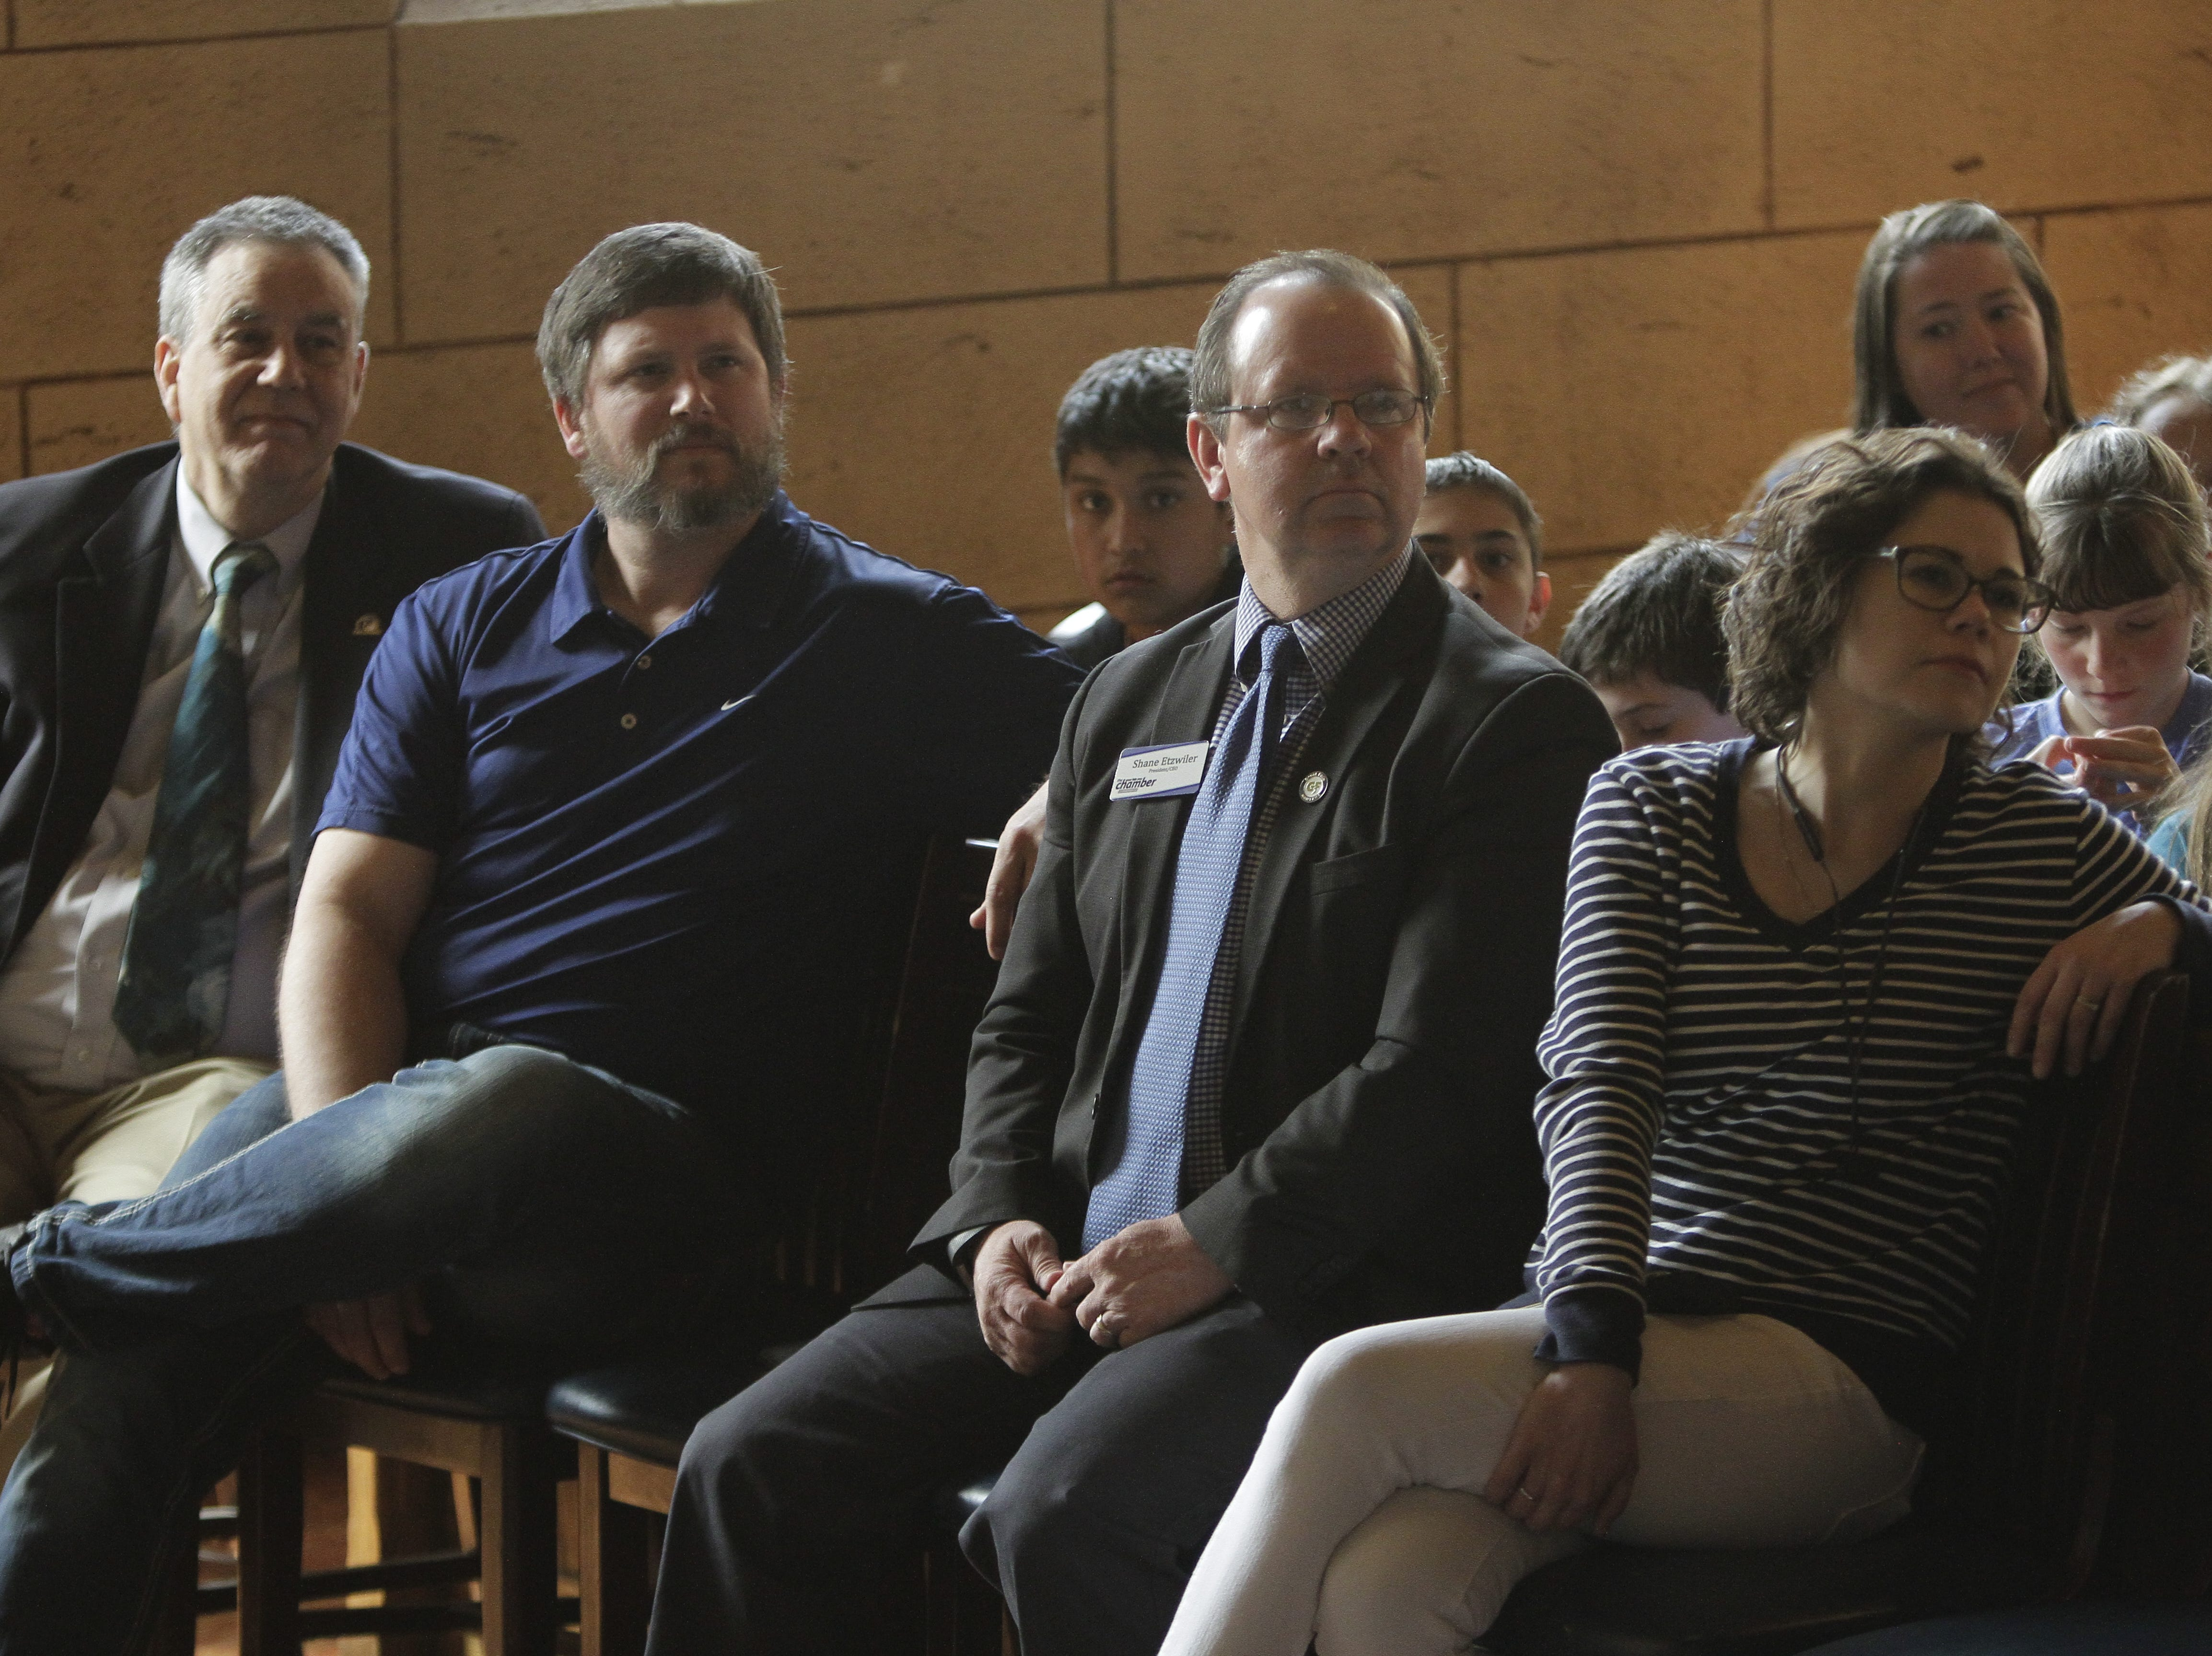 David Culpepper, Dustin Bauer, Shane Etzwiler and Teresa Schreiner watching the documentary.